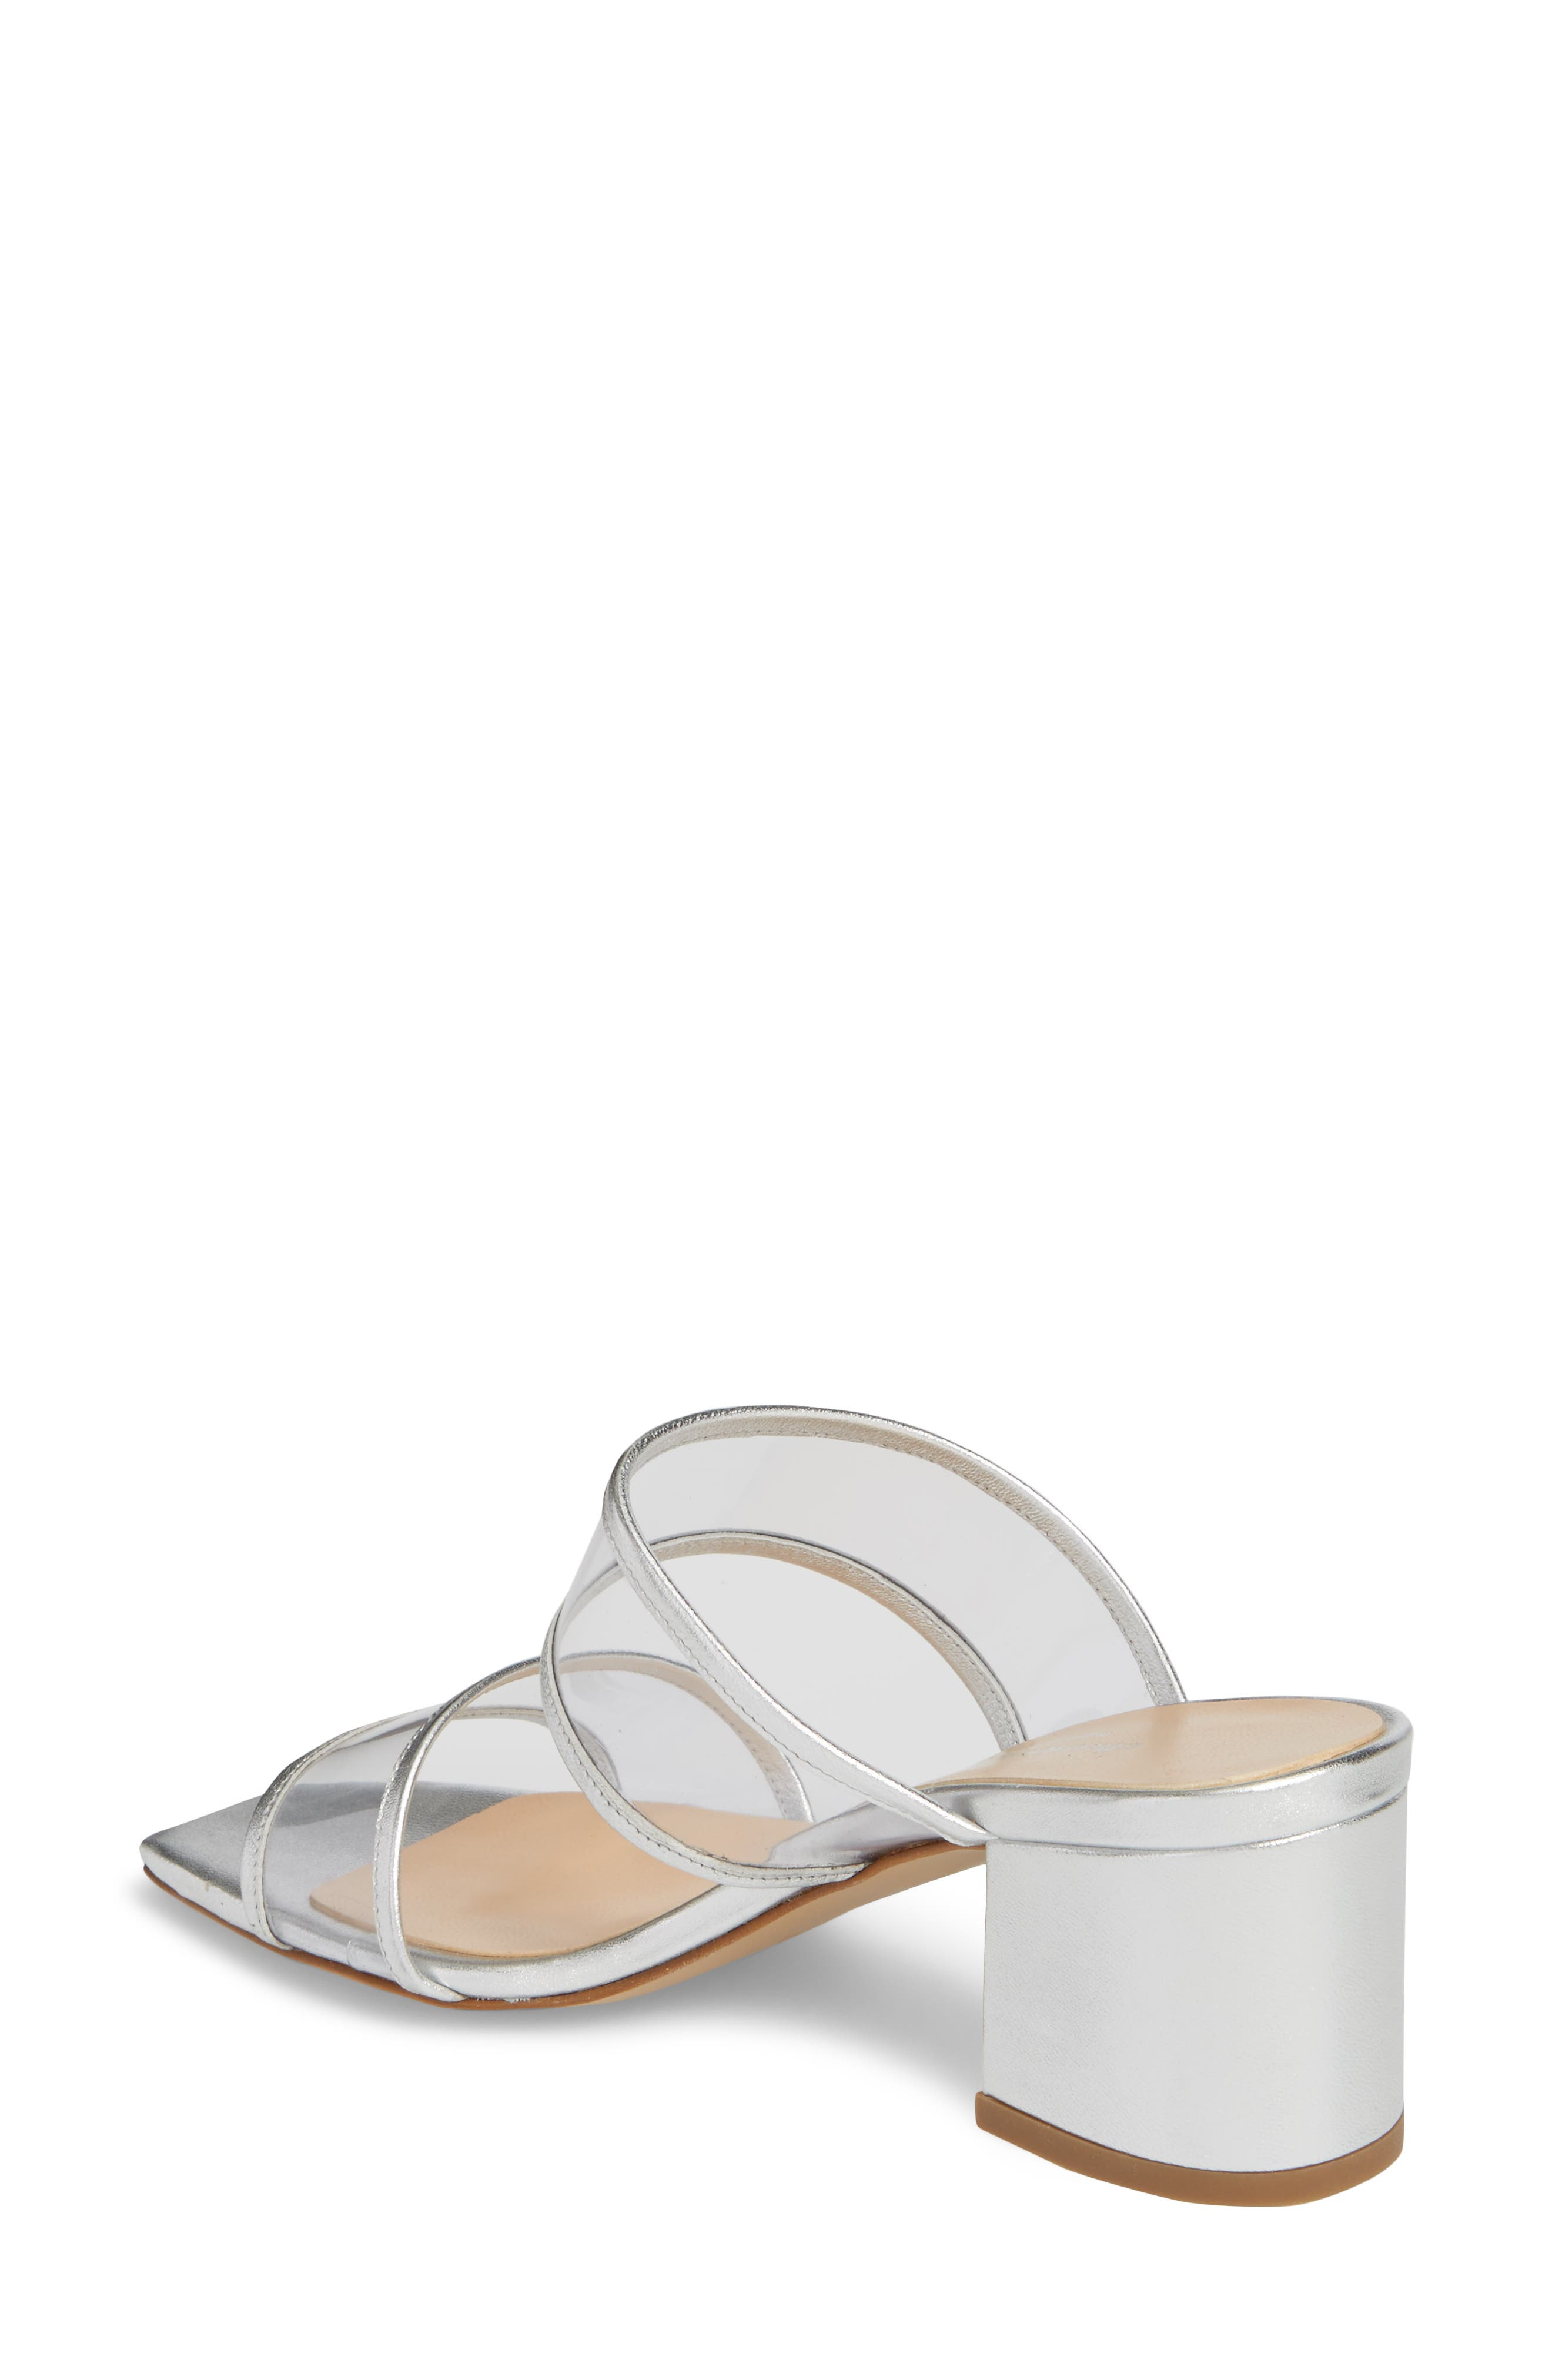 Cally Transparent Strap Slide Sandal,                             Alternate thumbnail 2, color,                             Silver